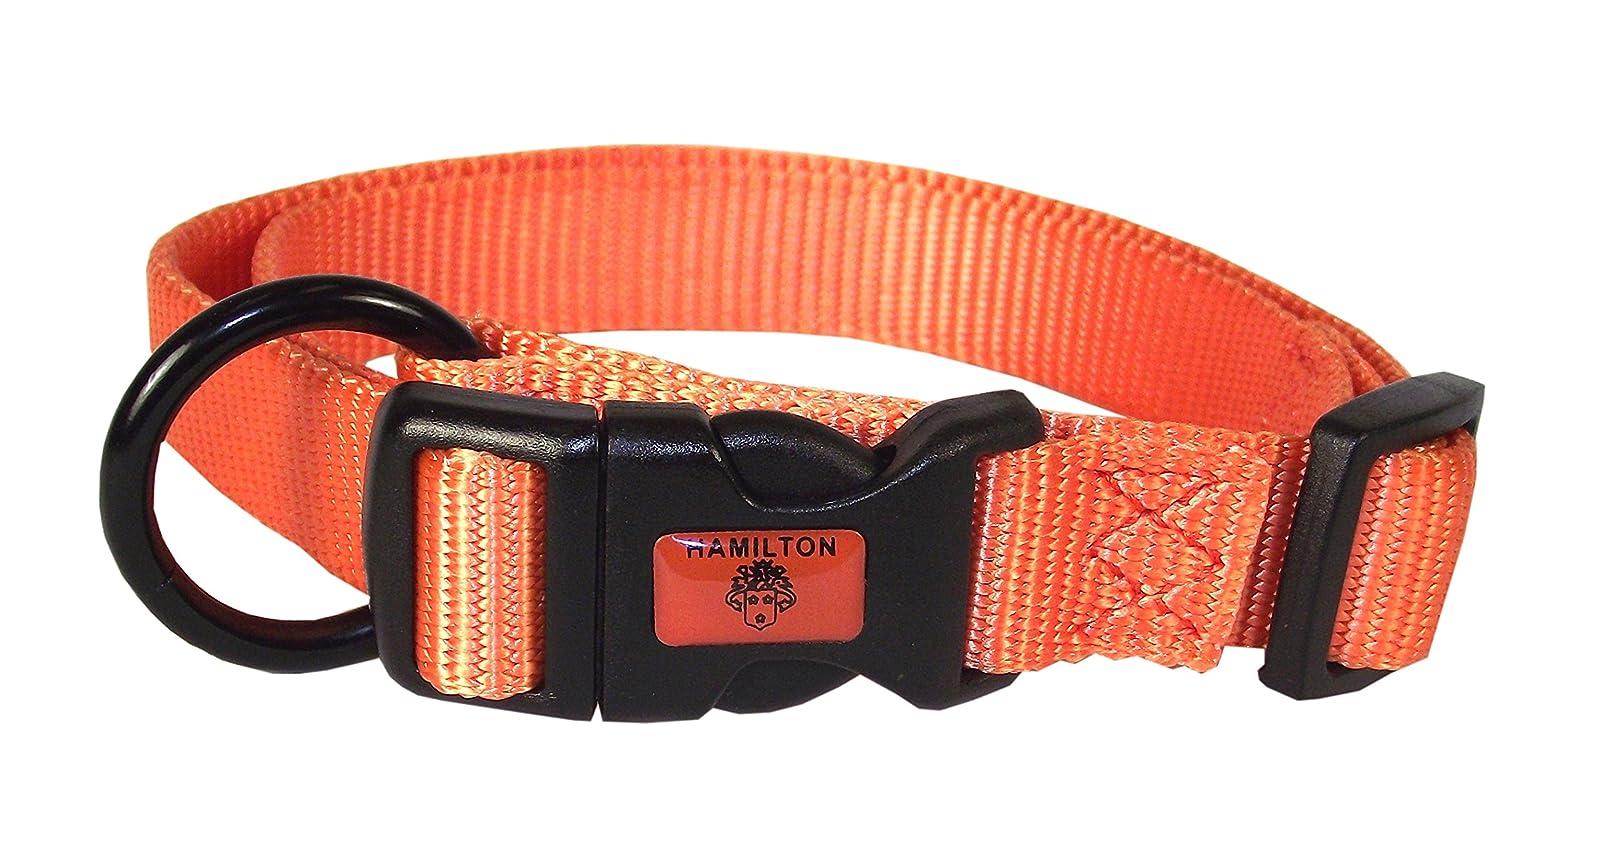 Hamilton Adjustable Nylon Dog Collar FAL 18/26 MA Mango Orange - 1